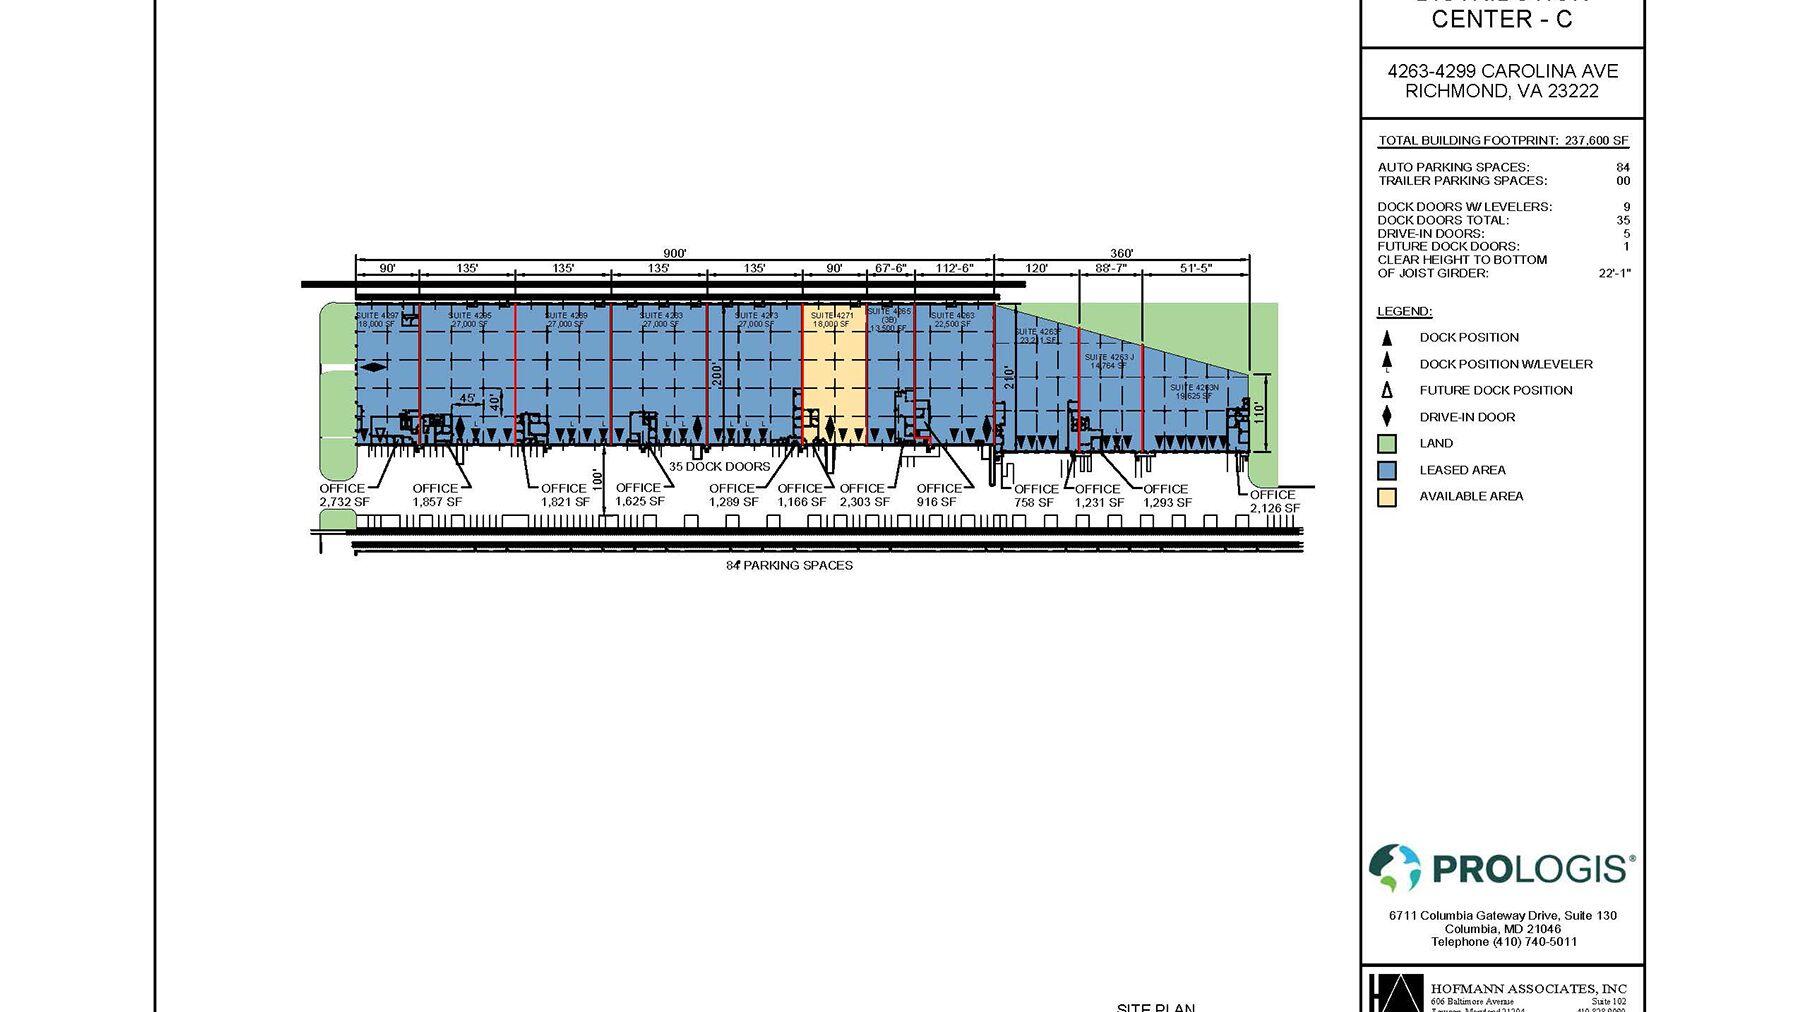 DPM-RDC-C-4271-Carolina-Ave-Site-Plan.jpg